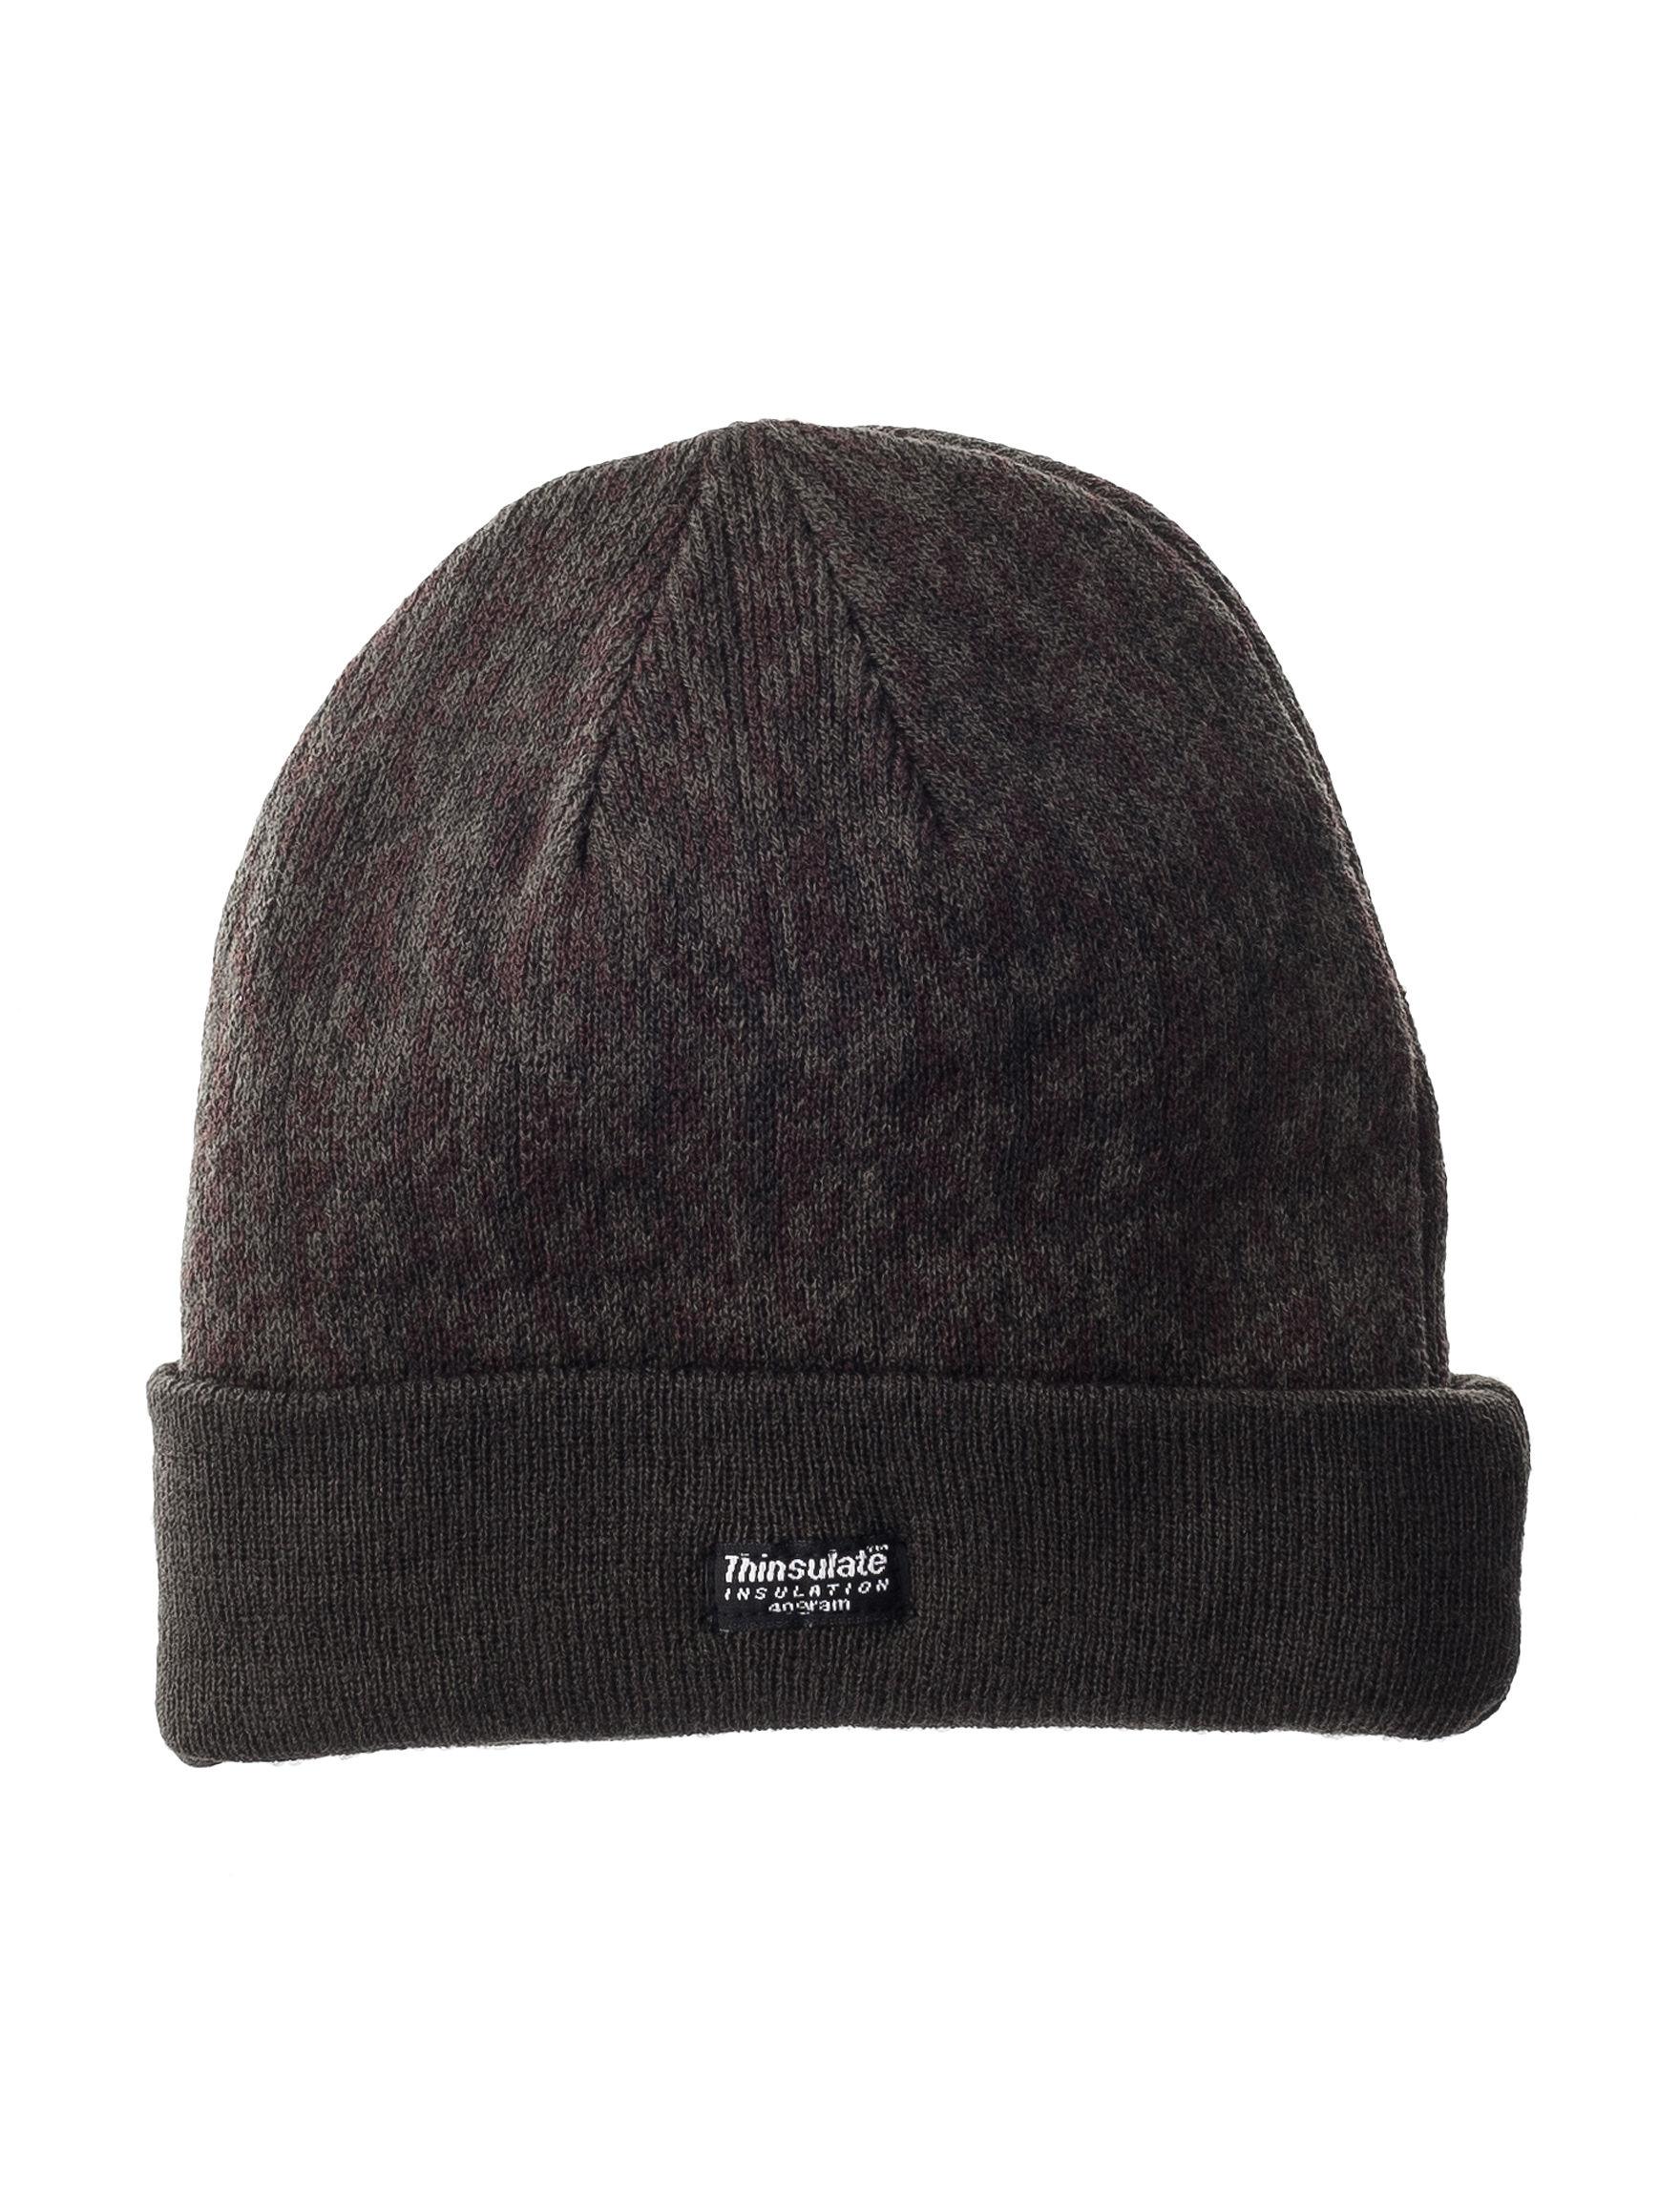 Huntworth Green Hats & Headwear